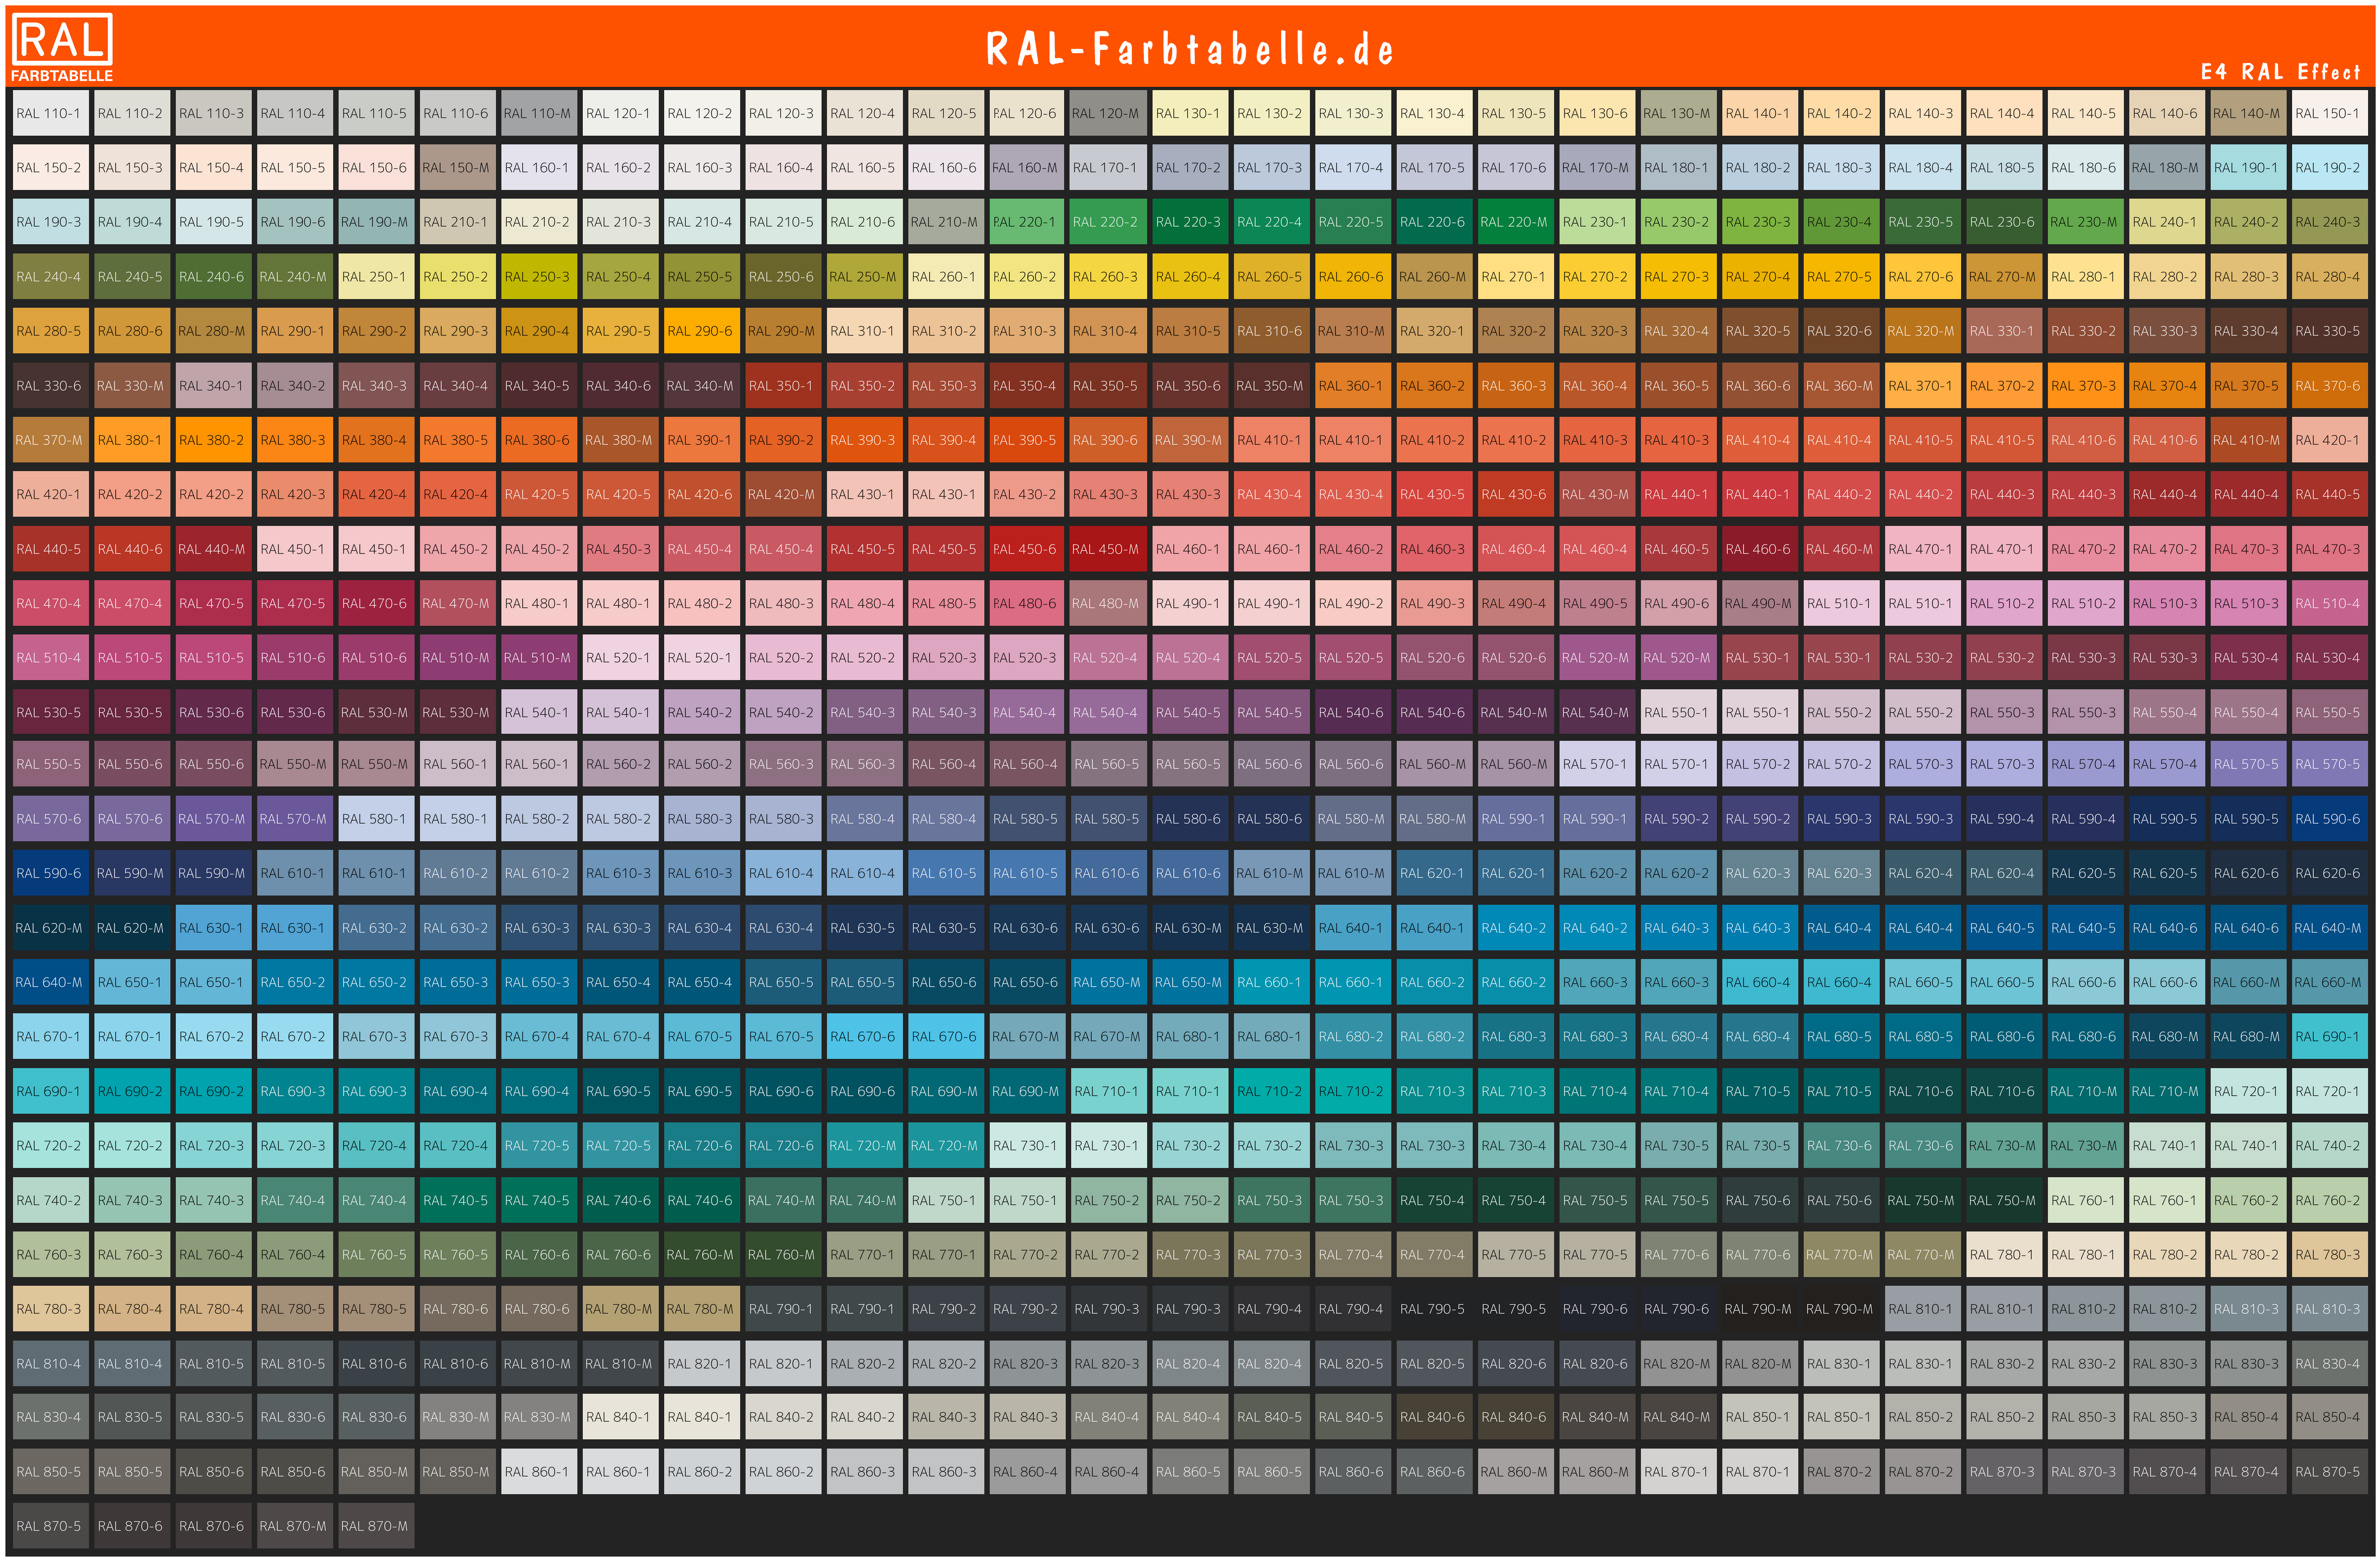 E4 RAL Effect Farbtabelle